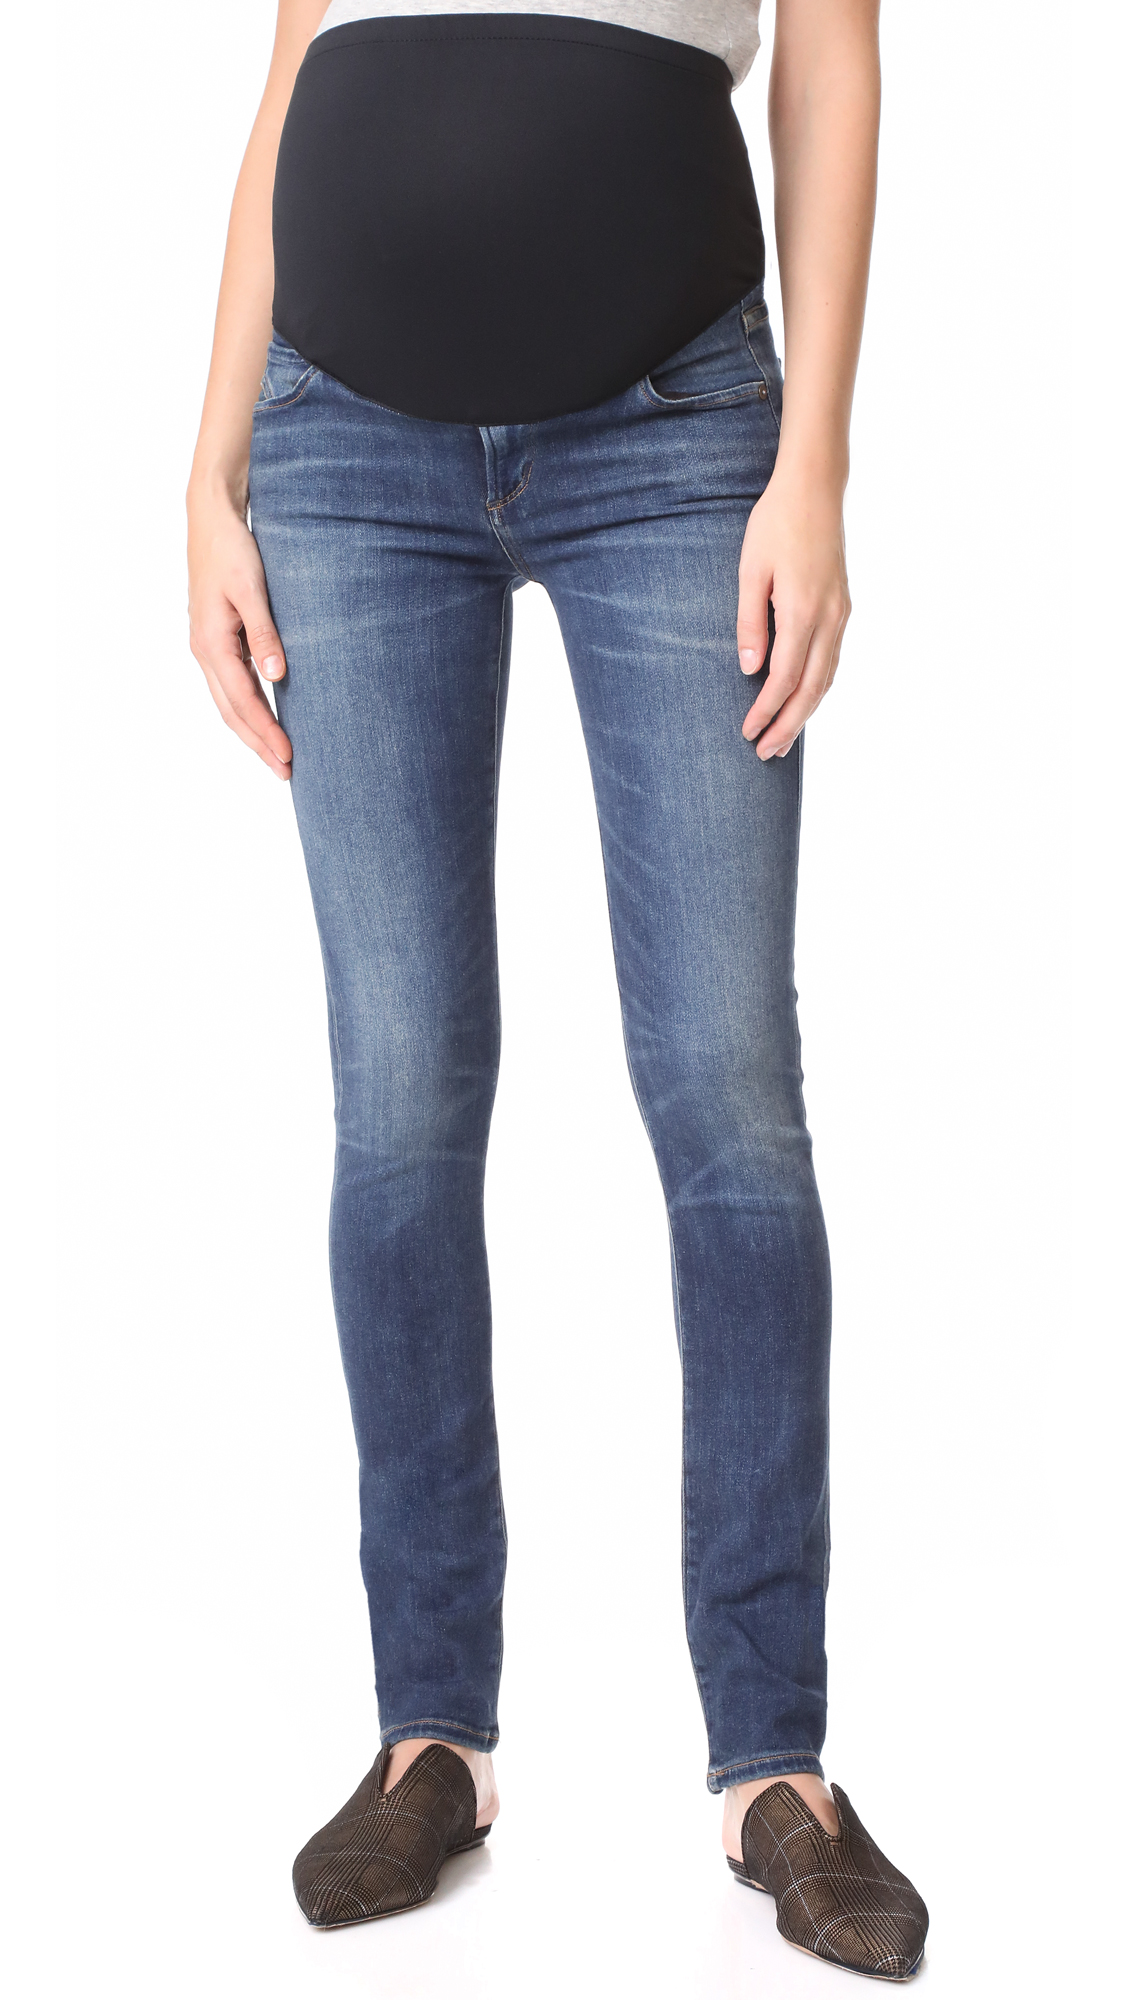 Avedon Skinny Maternity Jeans